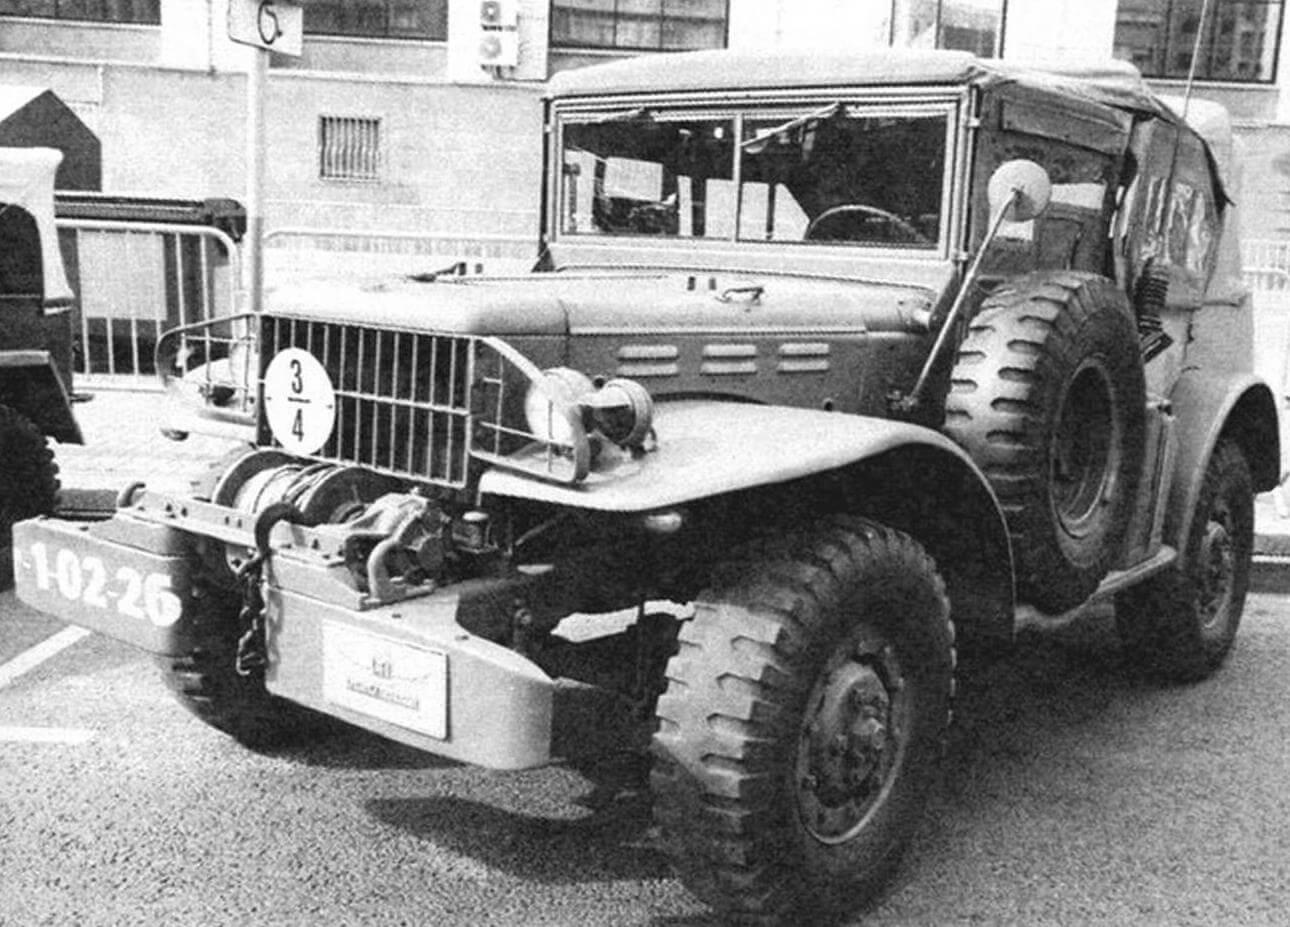 Dodge WC58 оснащался радиостанцией